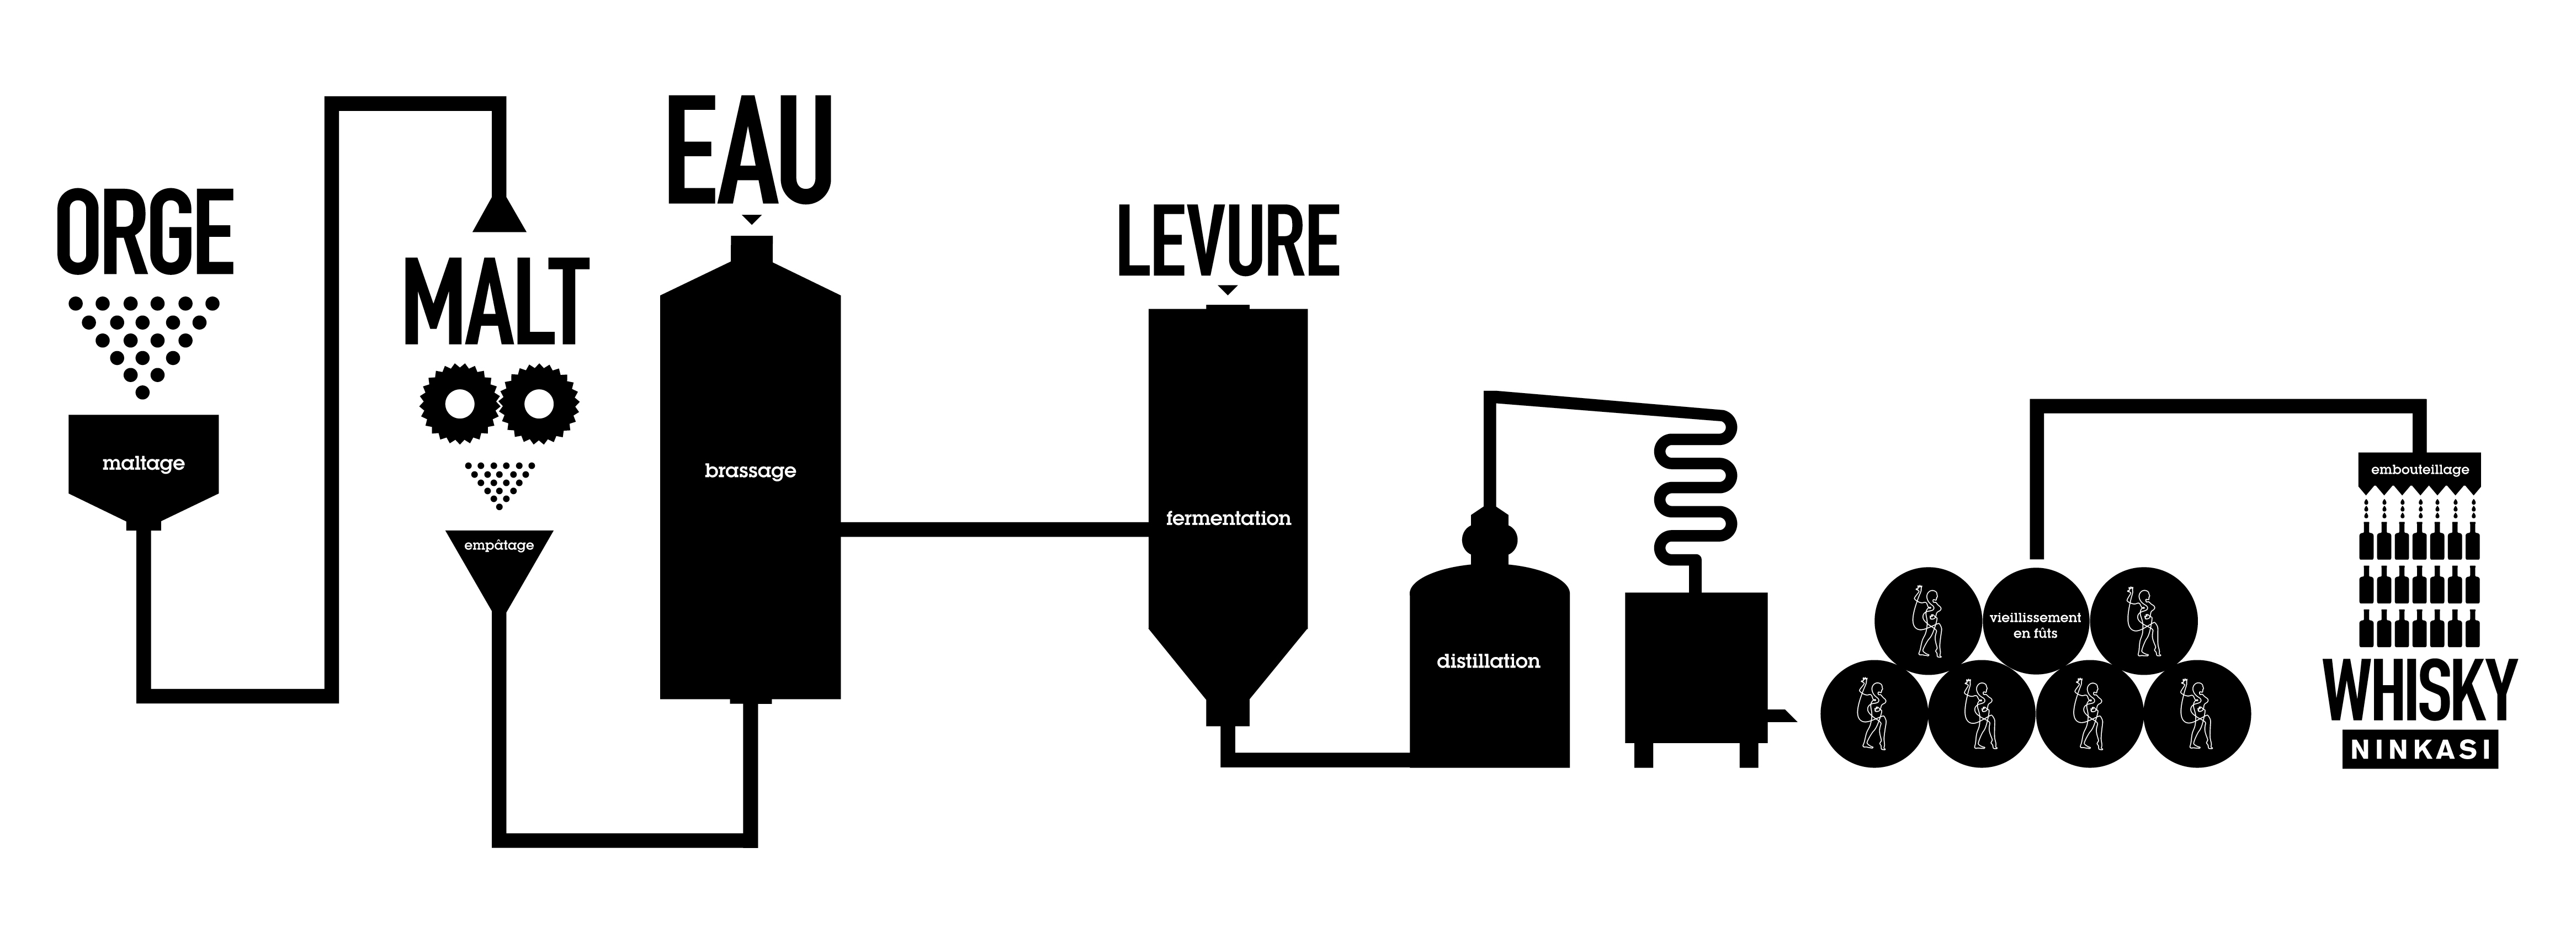 Schéma de fabrication du whisky